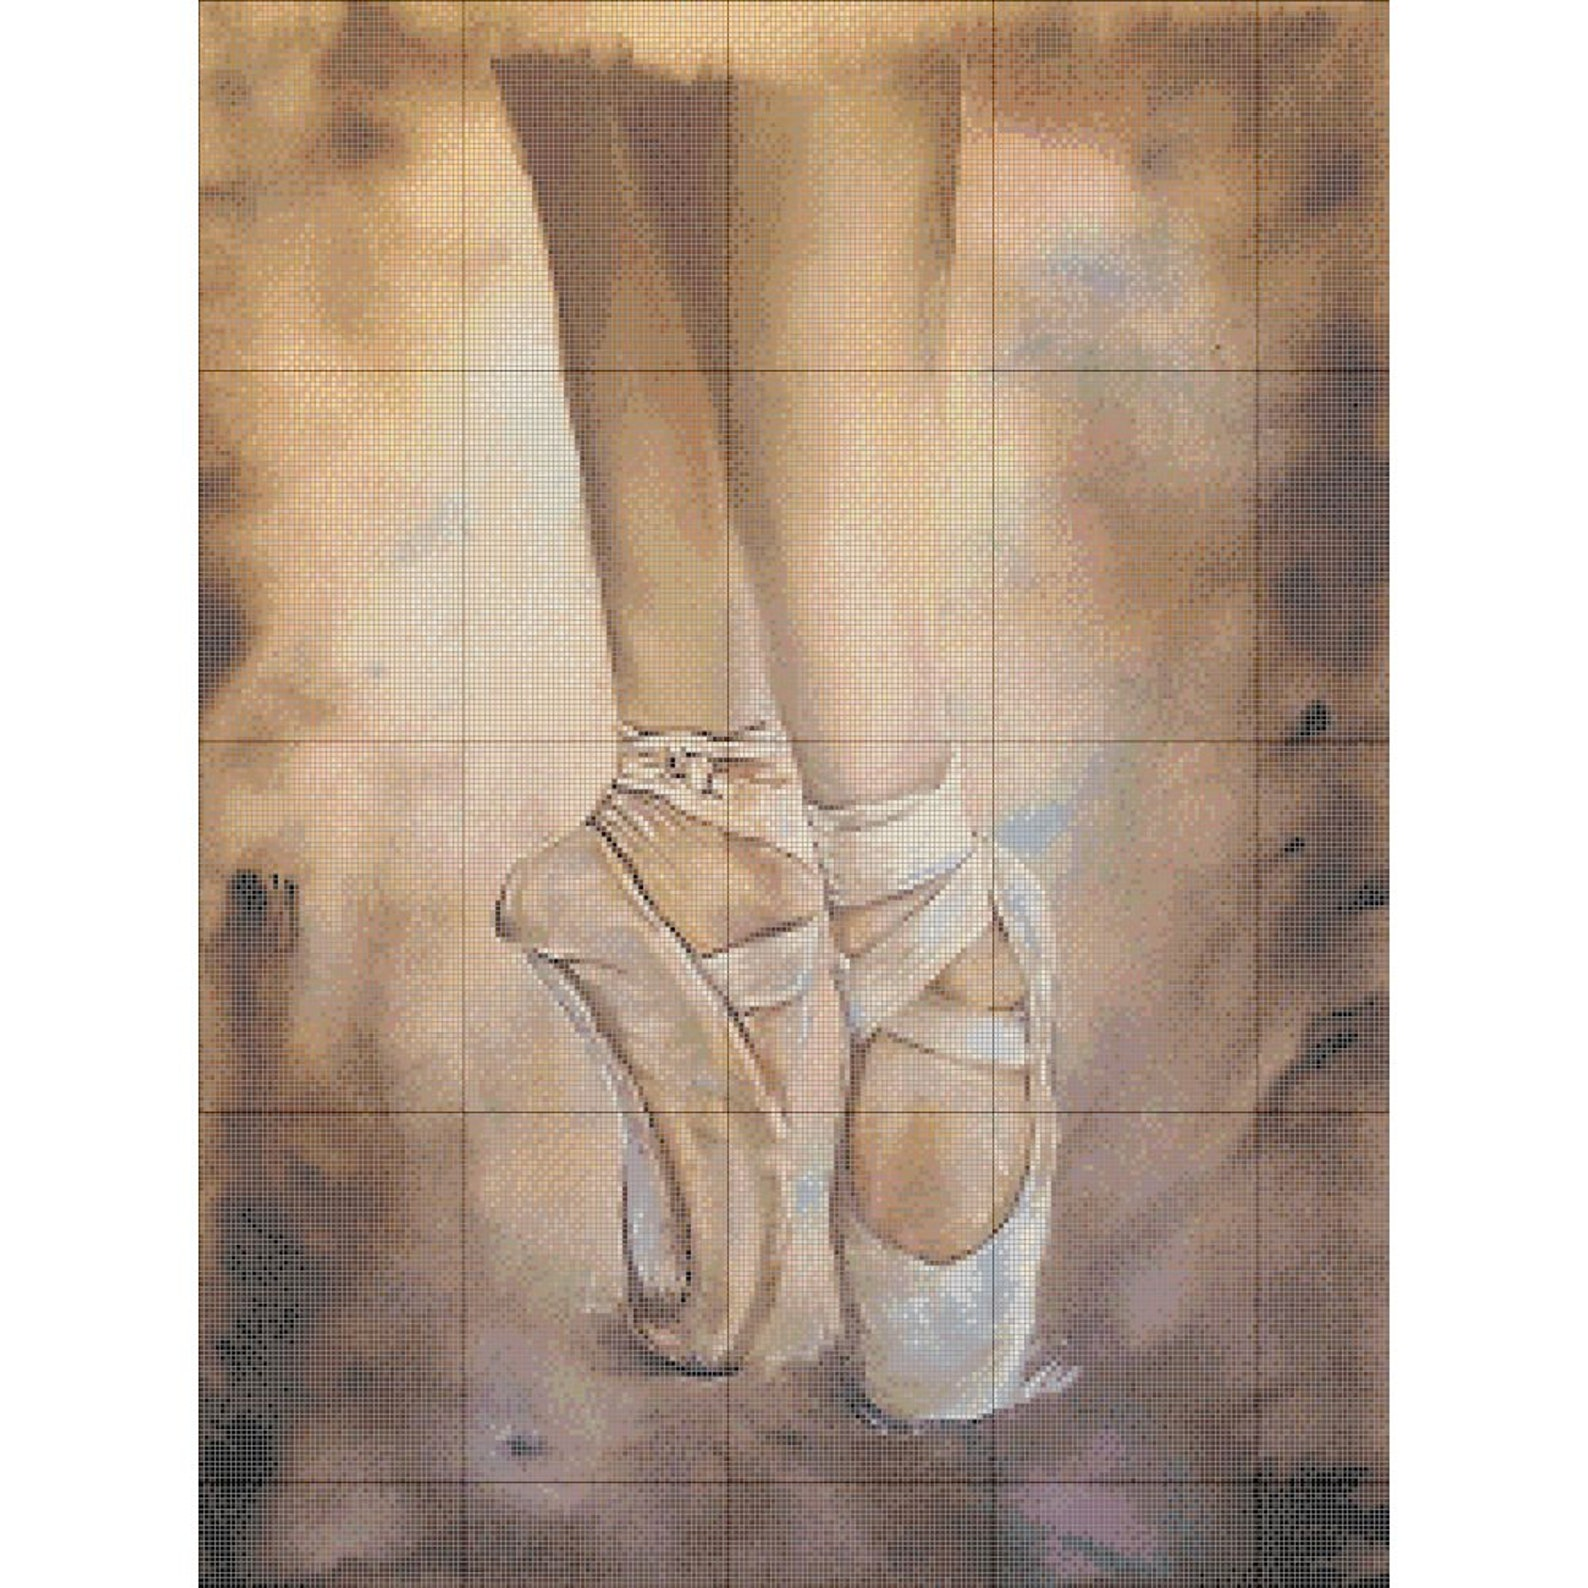 ballet shoes cross stitch chart / pattern - high quality cross stitch chart / pattern, original art by caroline lord o'donov